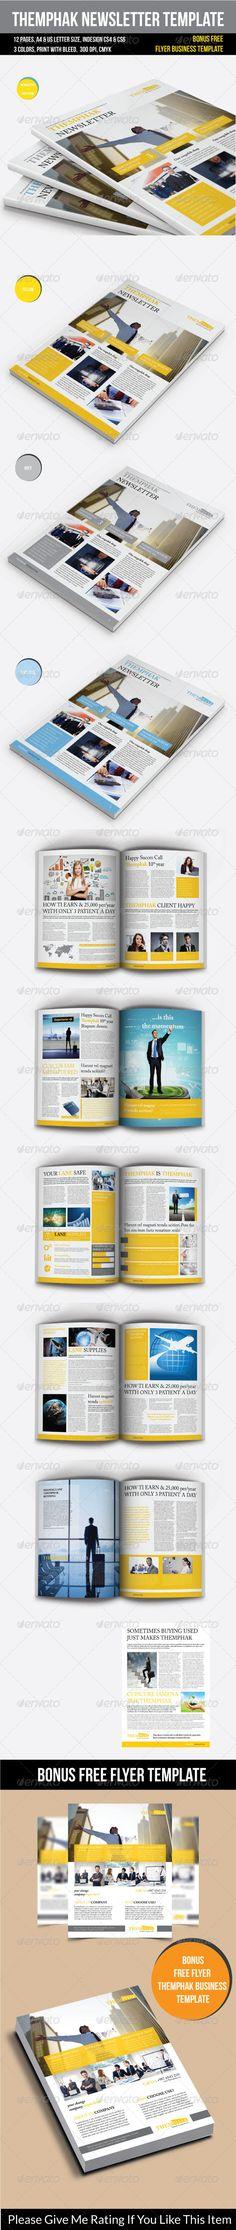 Real Estate - Newsletter Template Newsletter Design Pinterest - newsletter templates free word